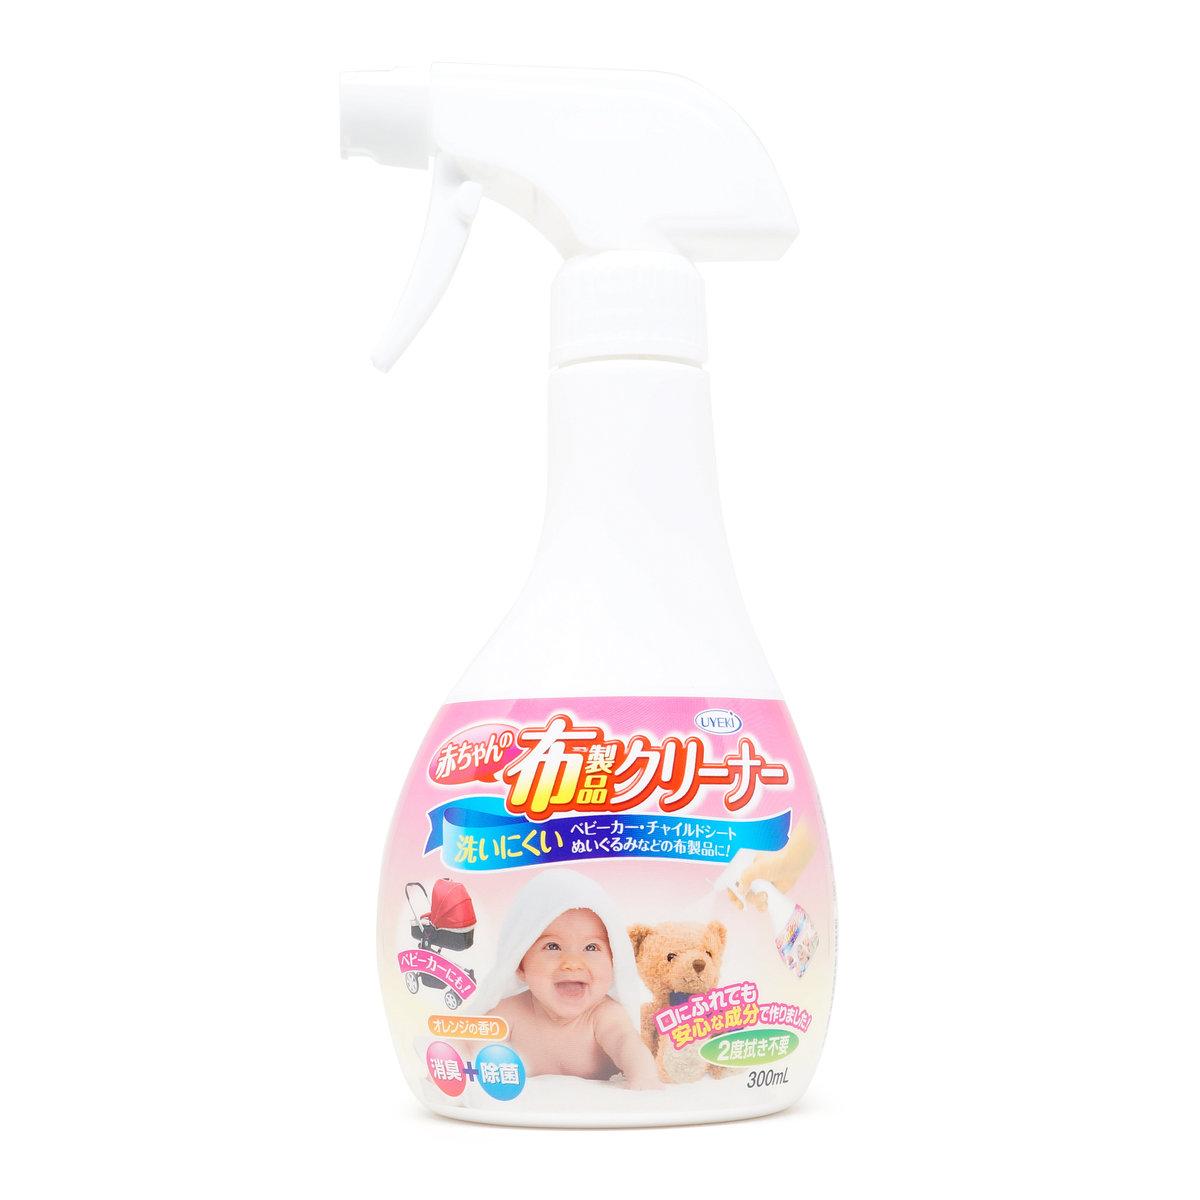 Fabric Cleaner Spray 300ml (4968909056145)